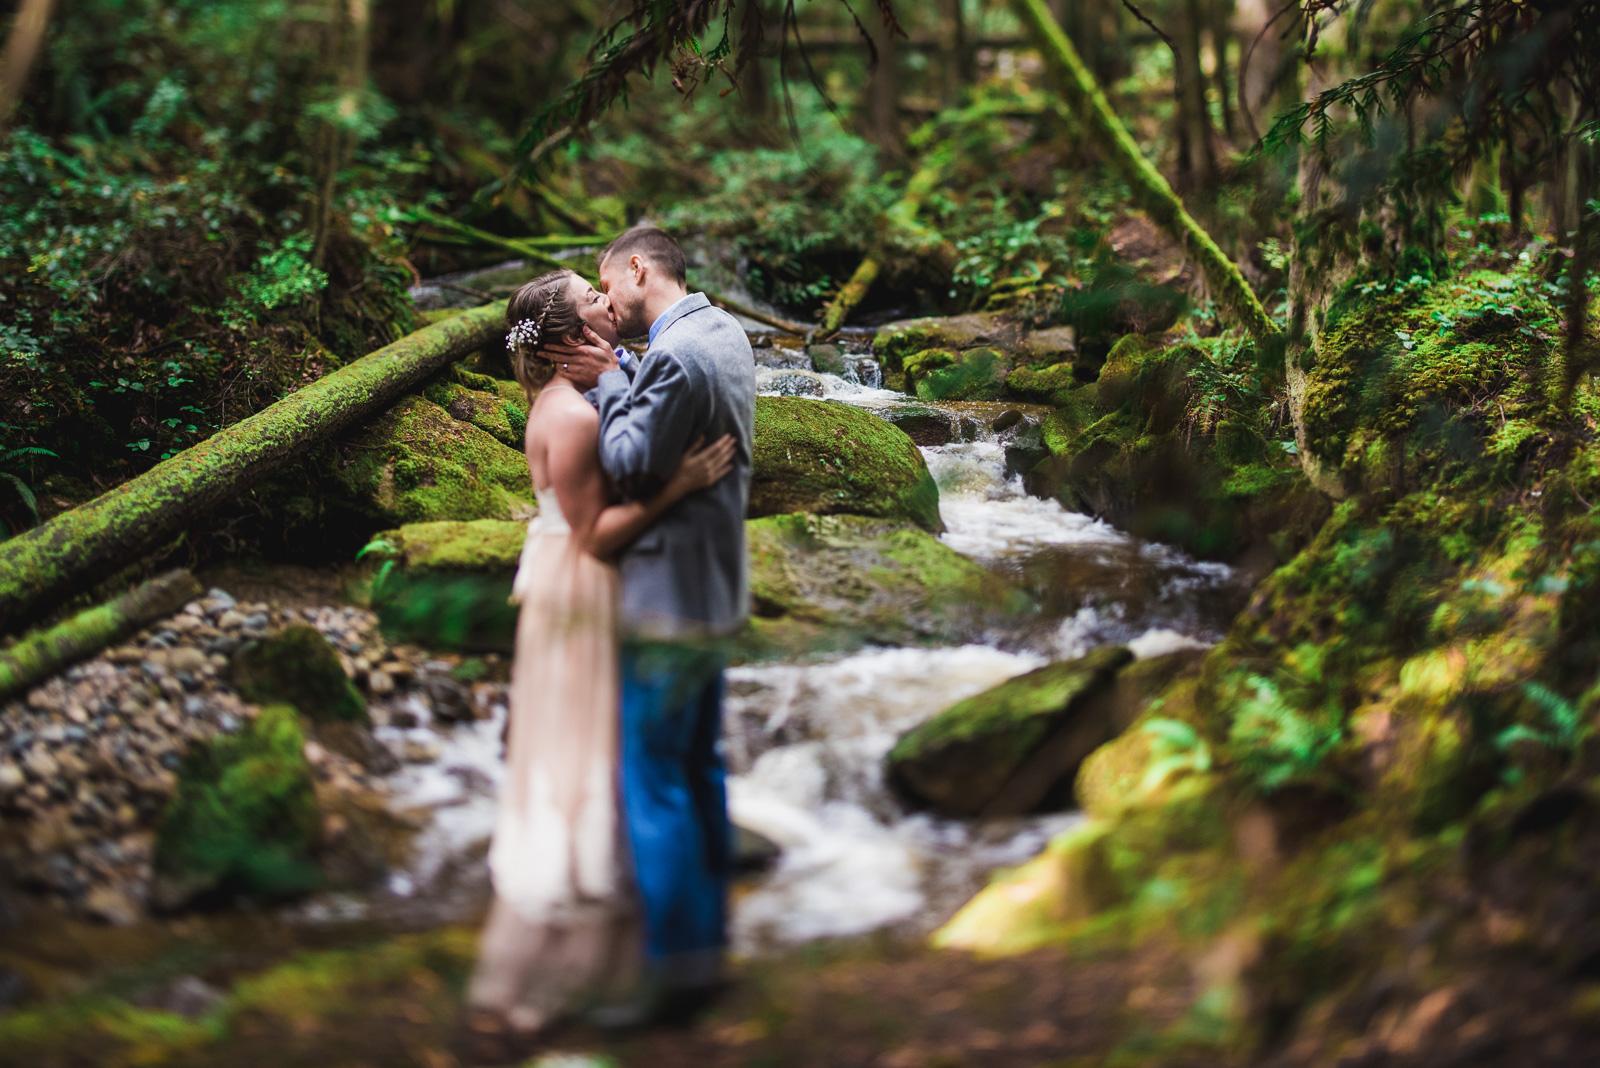 vancouver-island-wedding-photographers-cliff-gilker-park-smugglers-cove-elopement-13.jpg